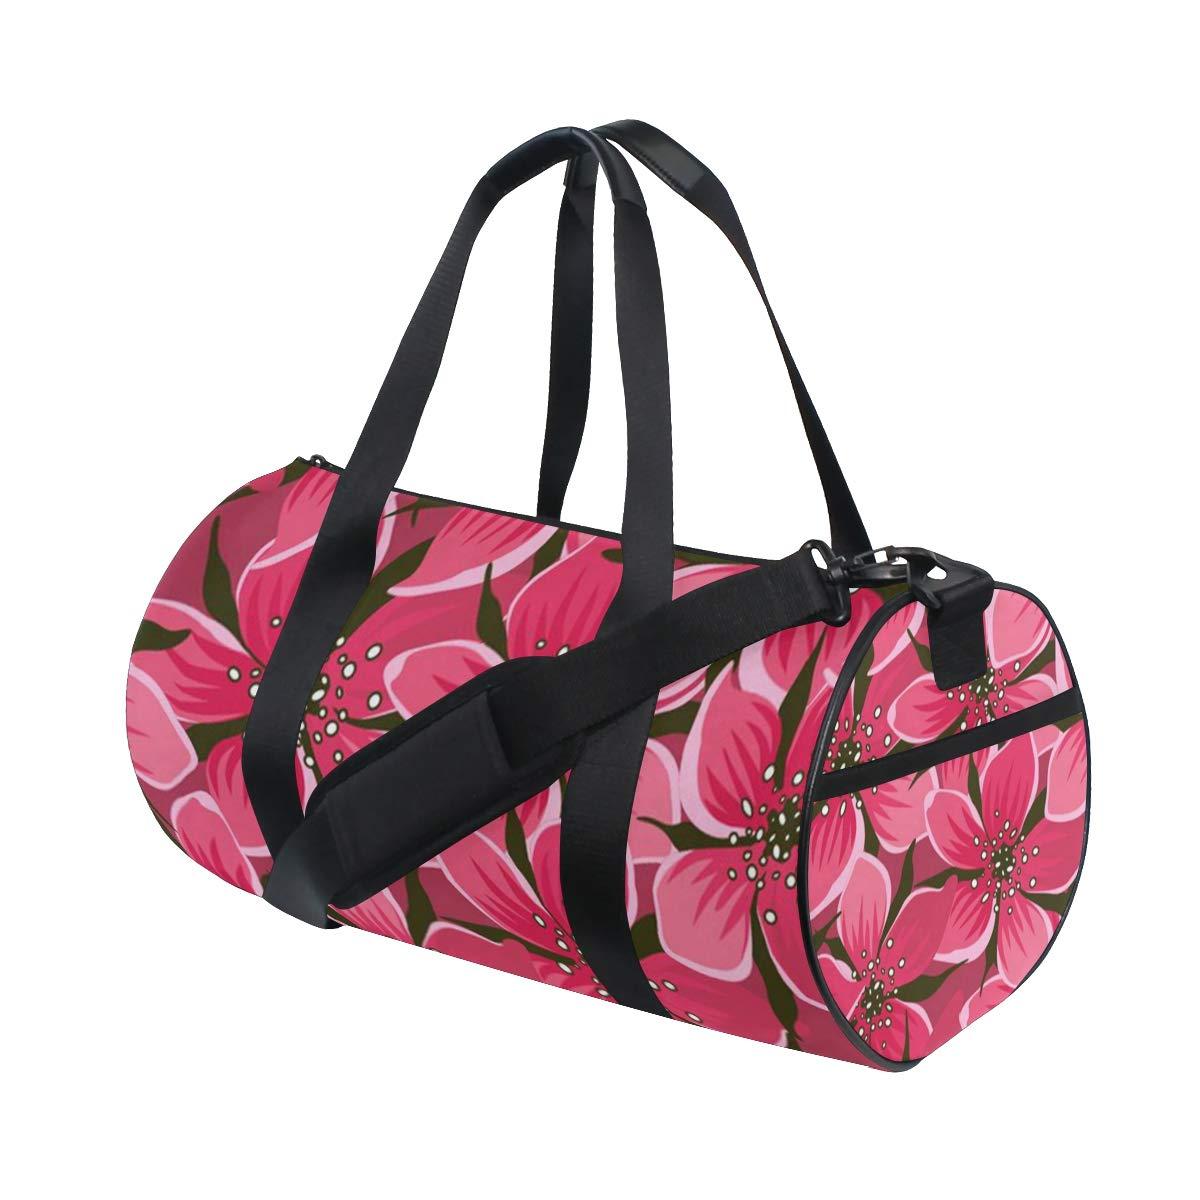 OuLian Women Gym Bag Tropical Flower Pattern Mens Camp Duffel Bags Duffle Luggage Travel Bag